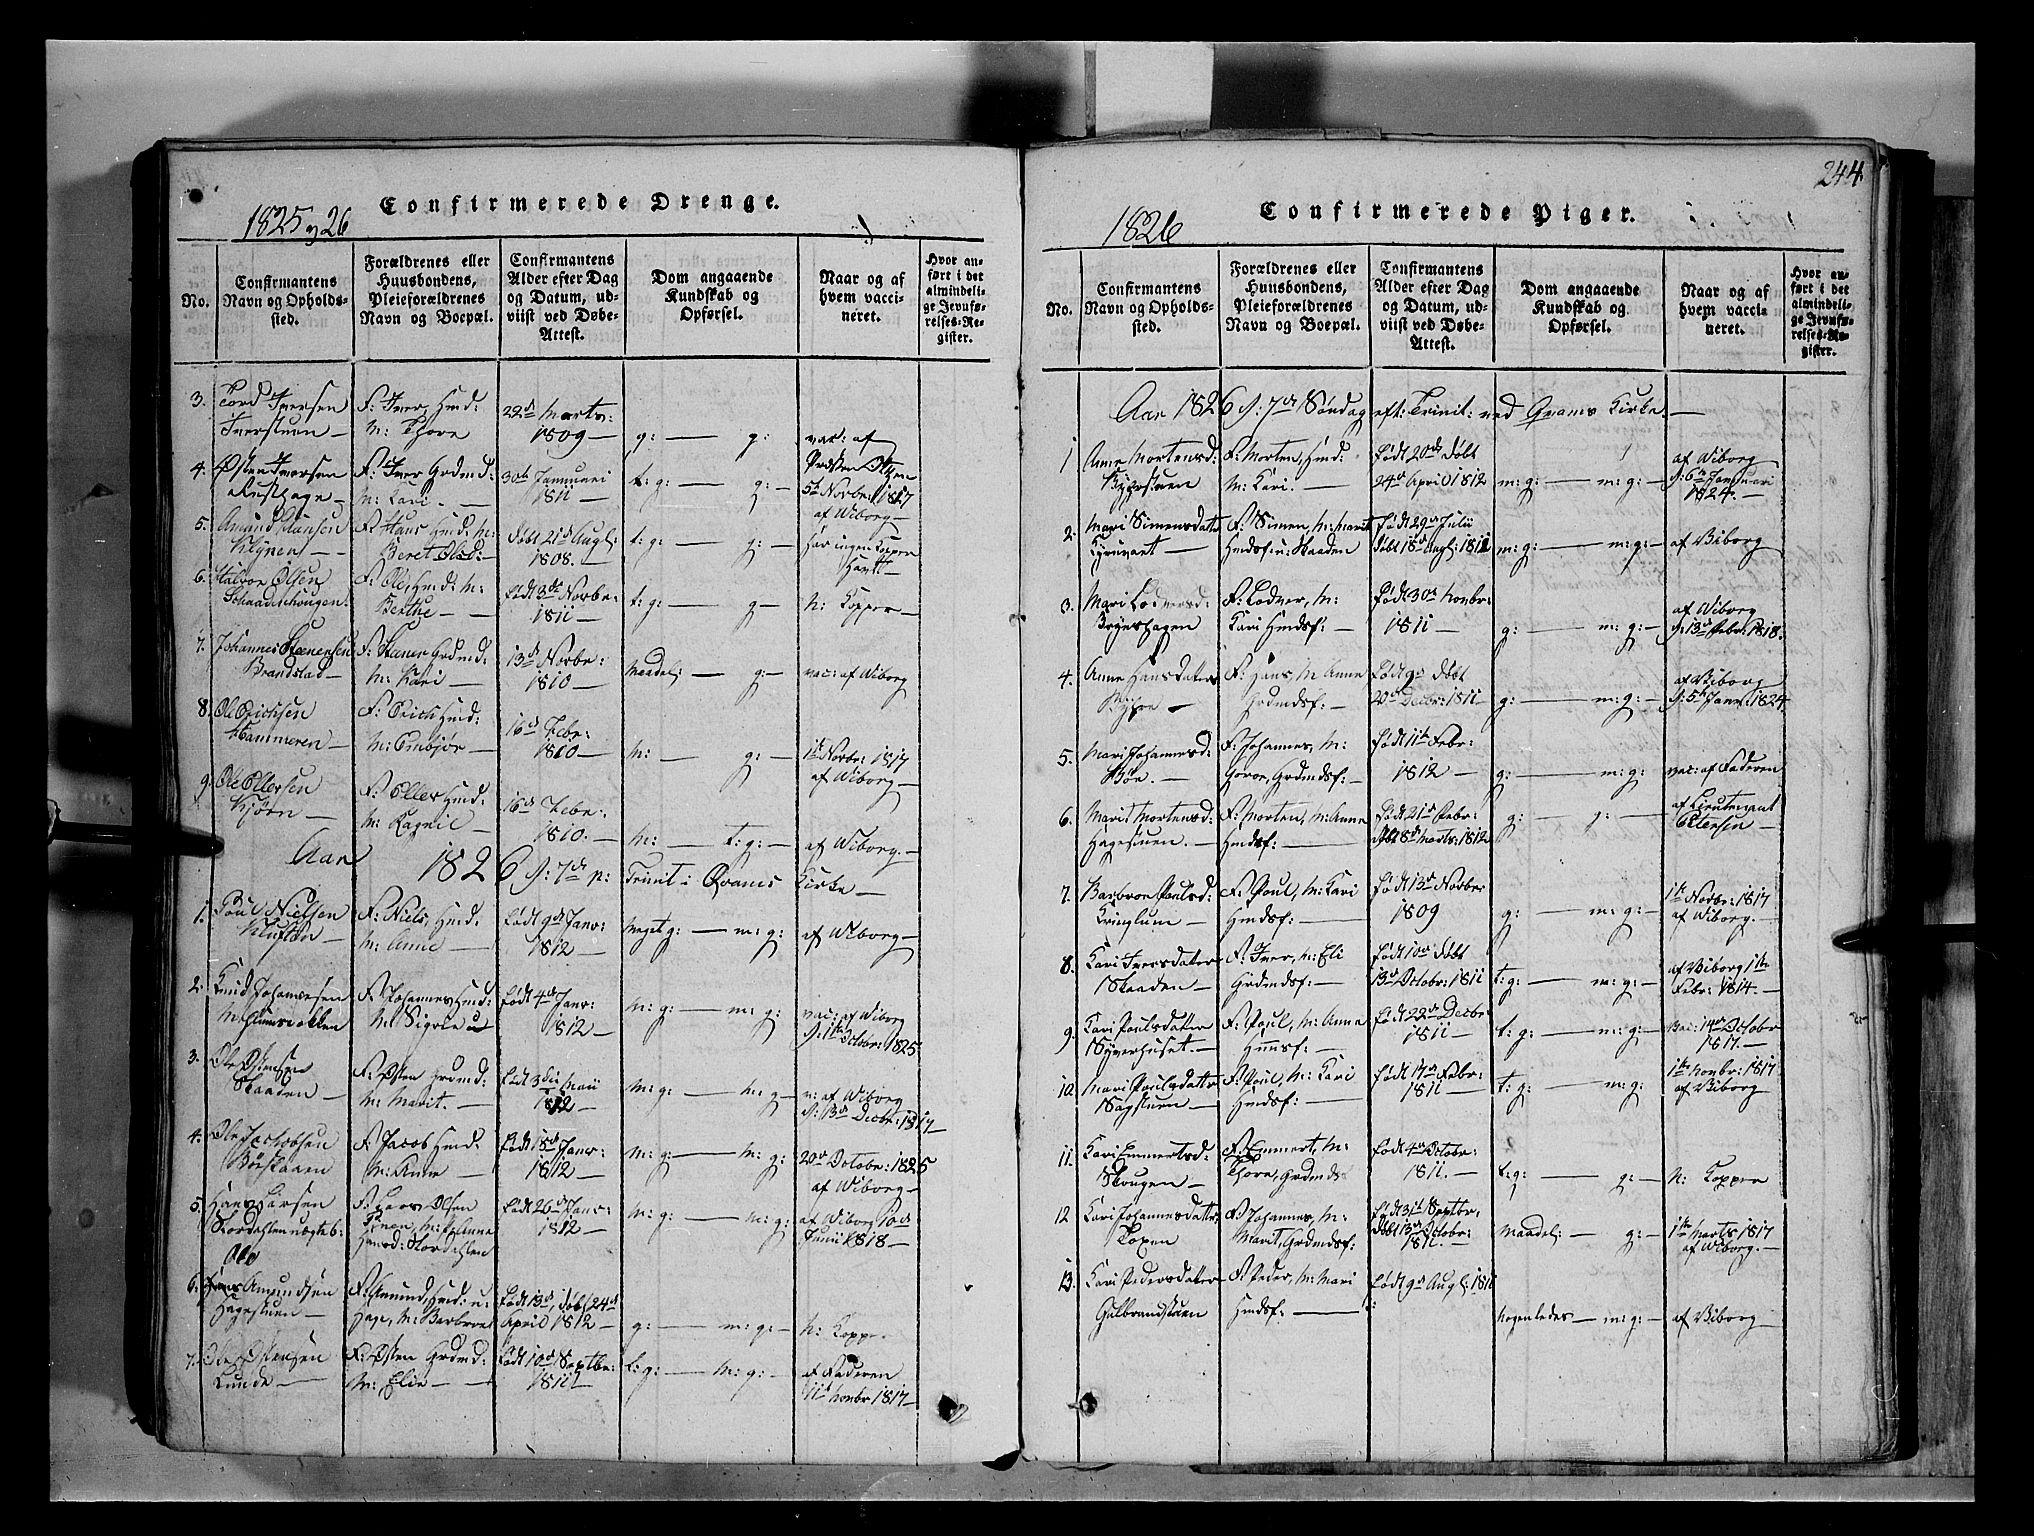 SAH, Fron prestekontor, H/Ha/Hab/L0004: Klokkerbok nr. 4, 1816-1850, s. 244